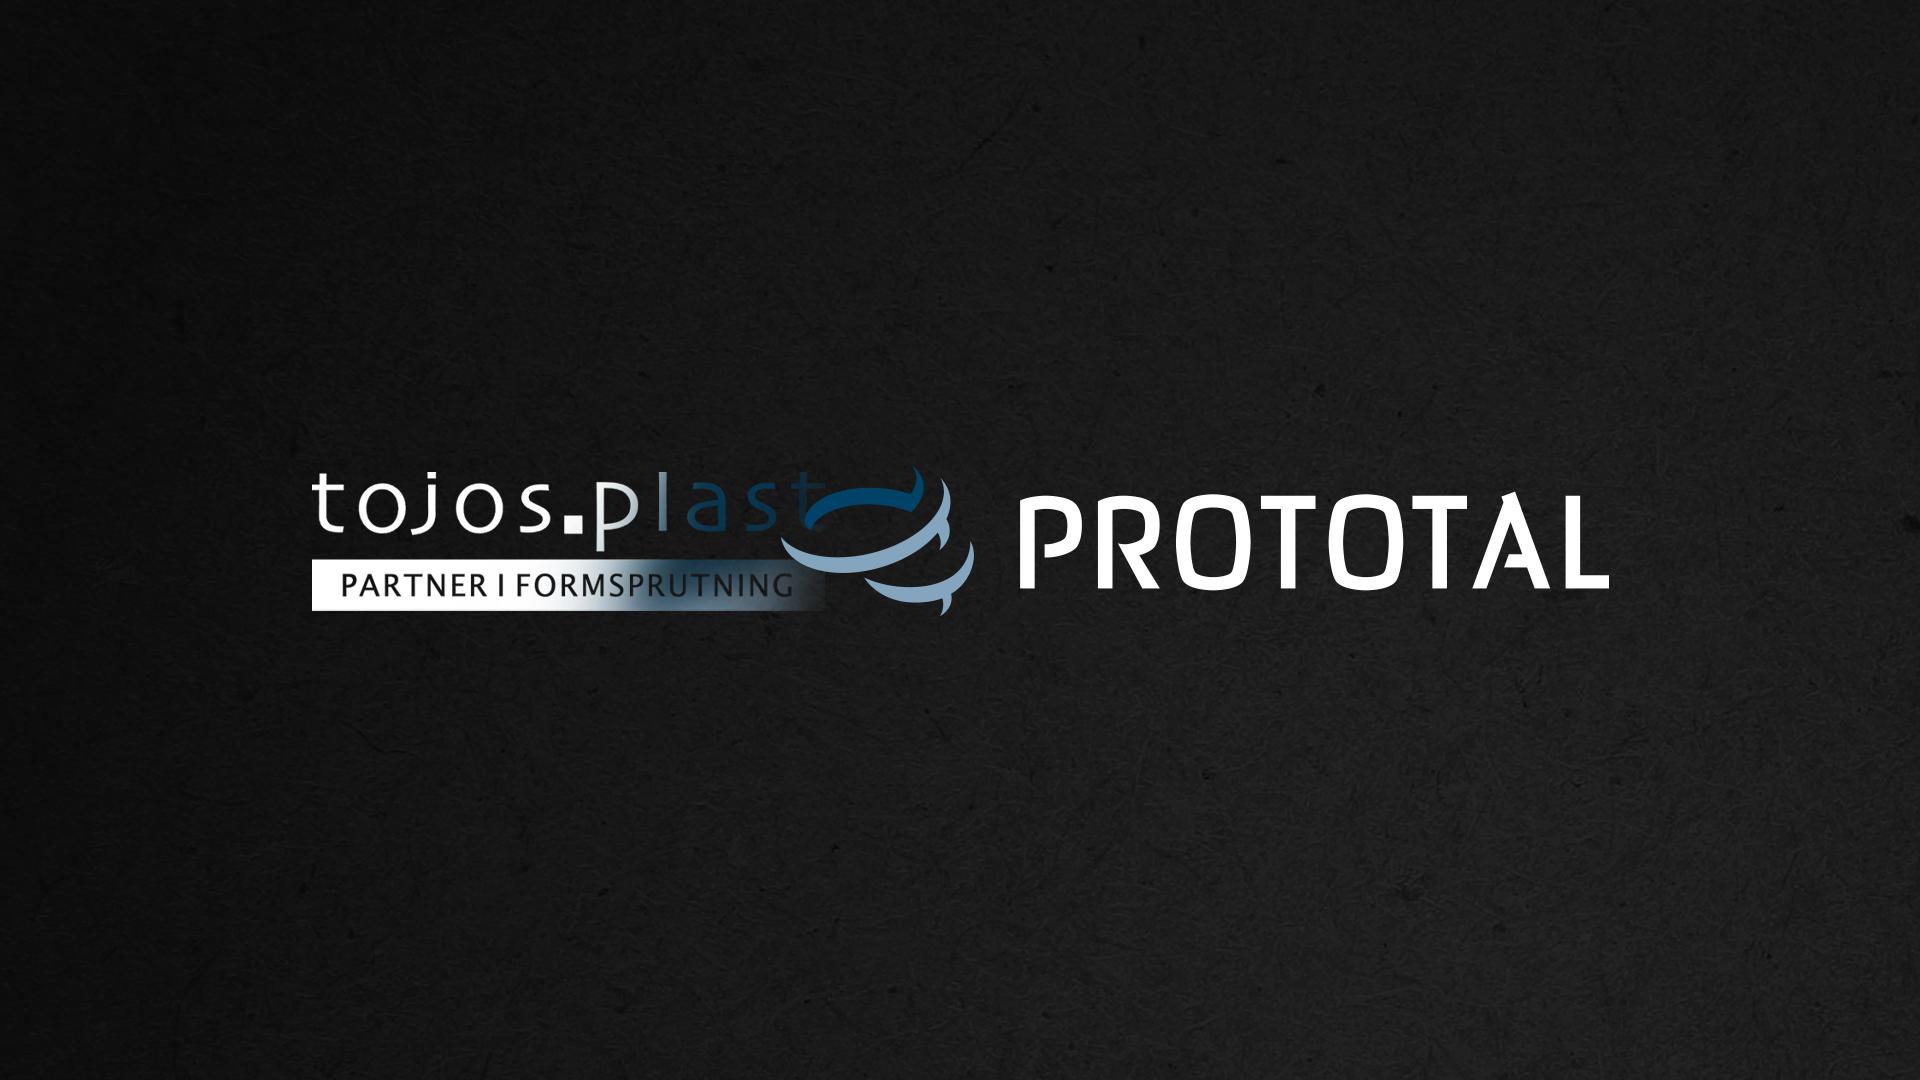 prototal_tojos_1920x1080.jpg